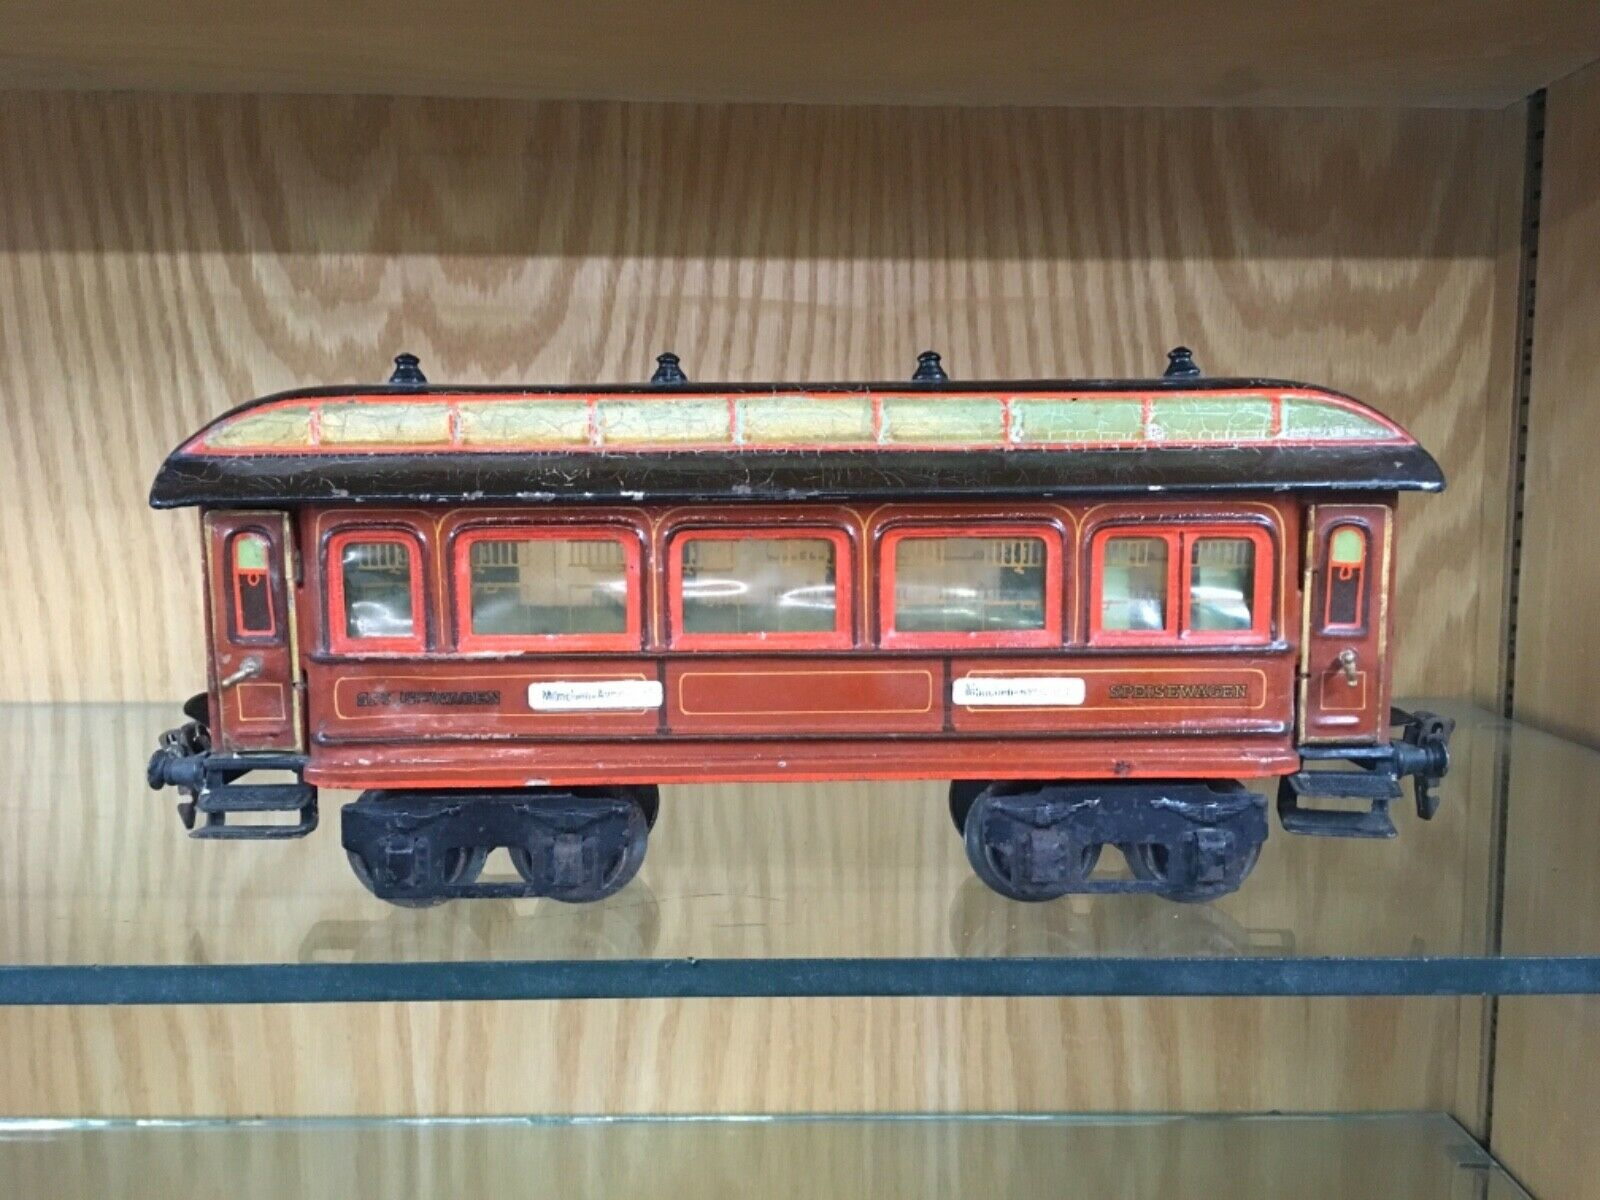 Märklin 1 Gauge Speisewagen München-Avricourt Dining Car c.1914-15 - VG